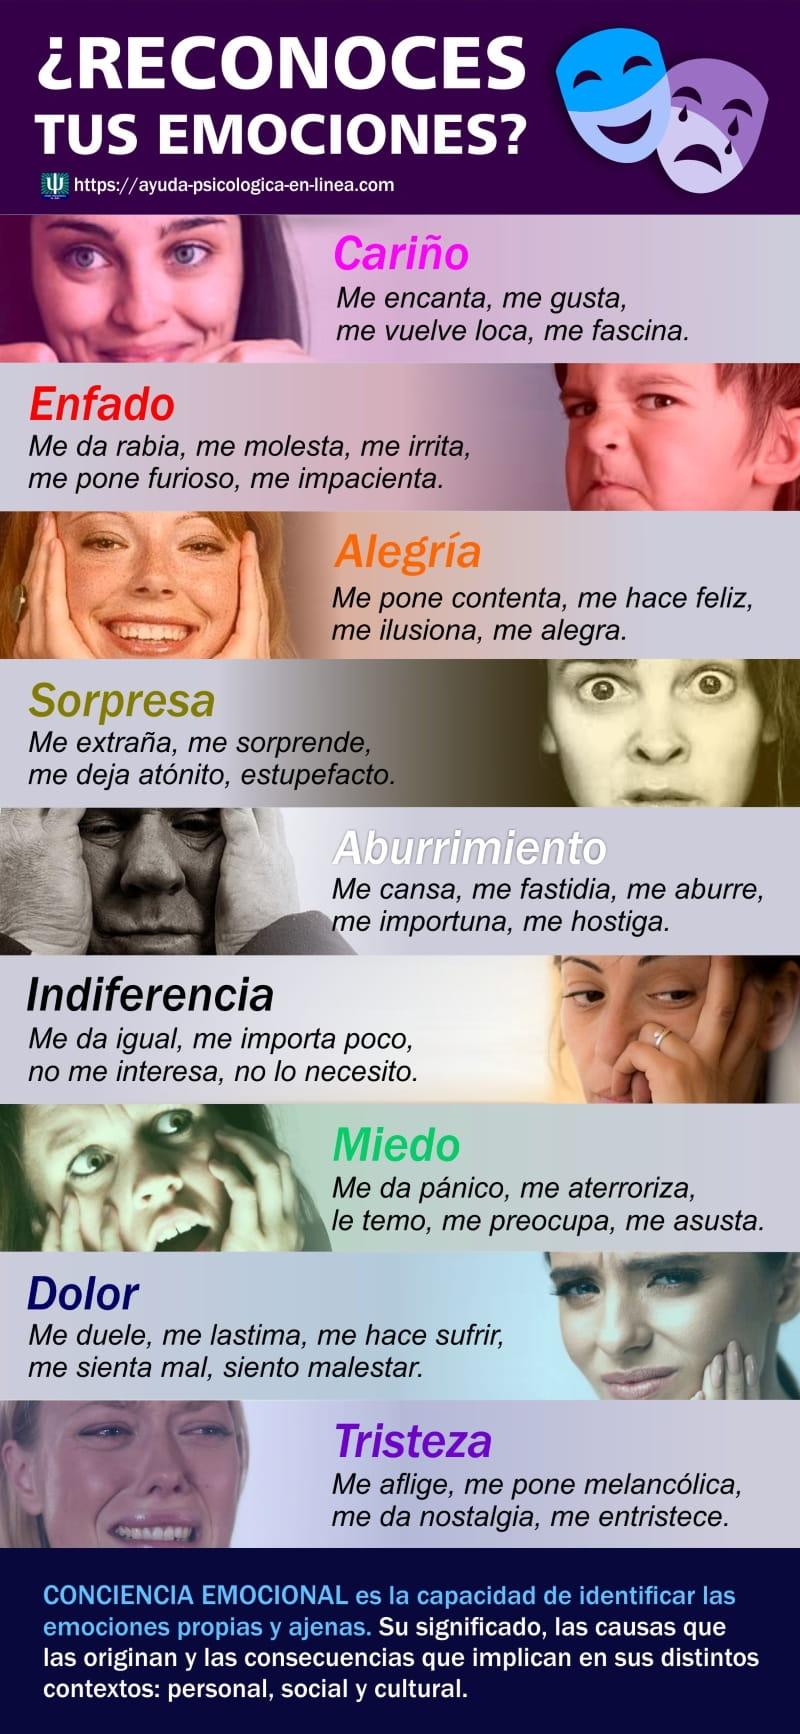 Infografia conciencia emocional